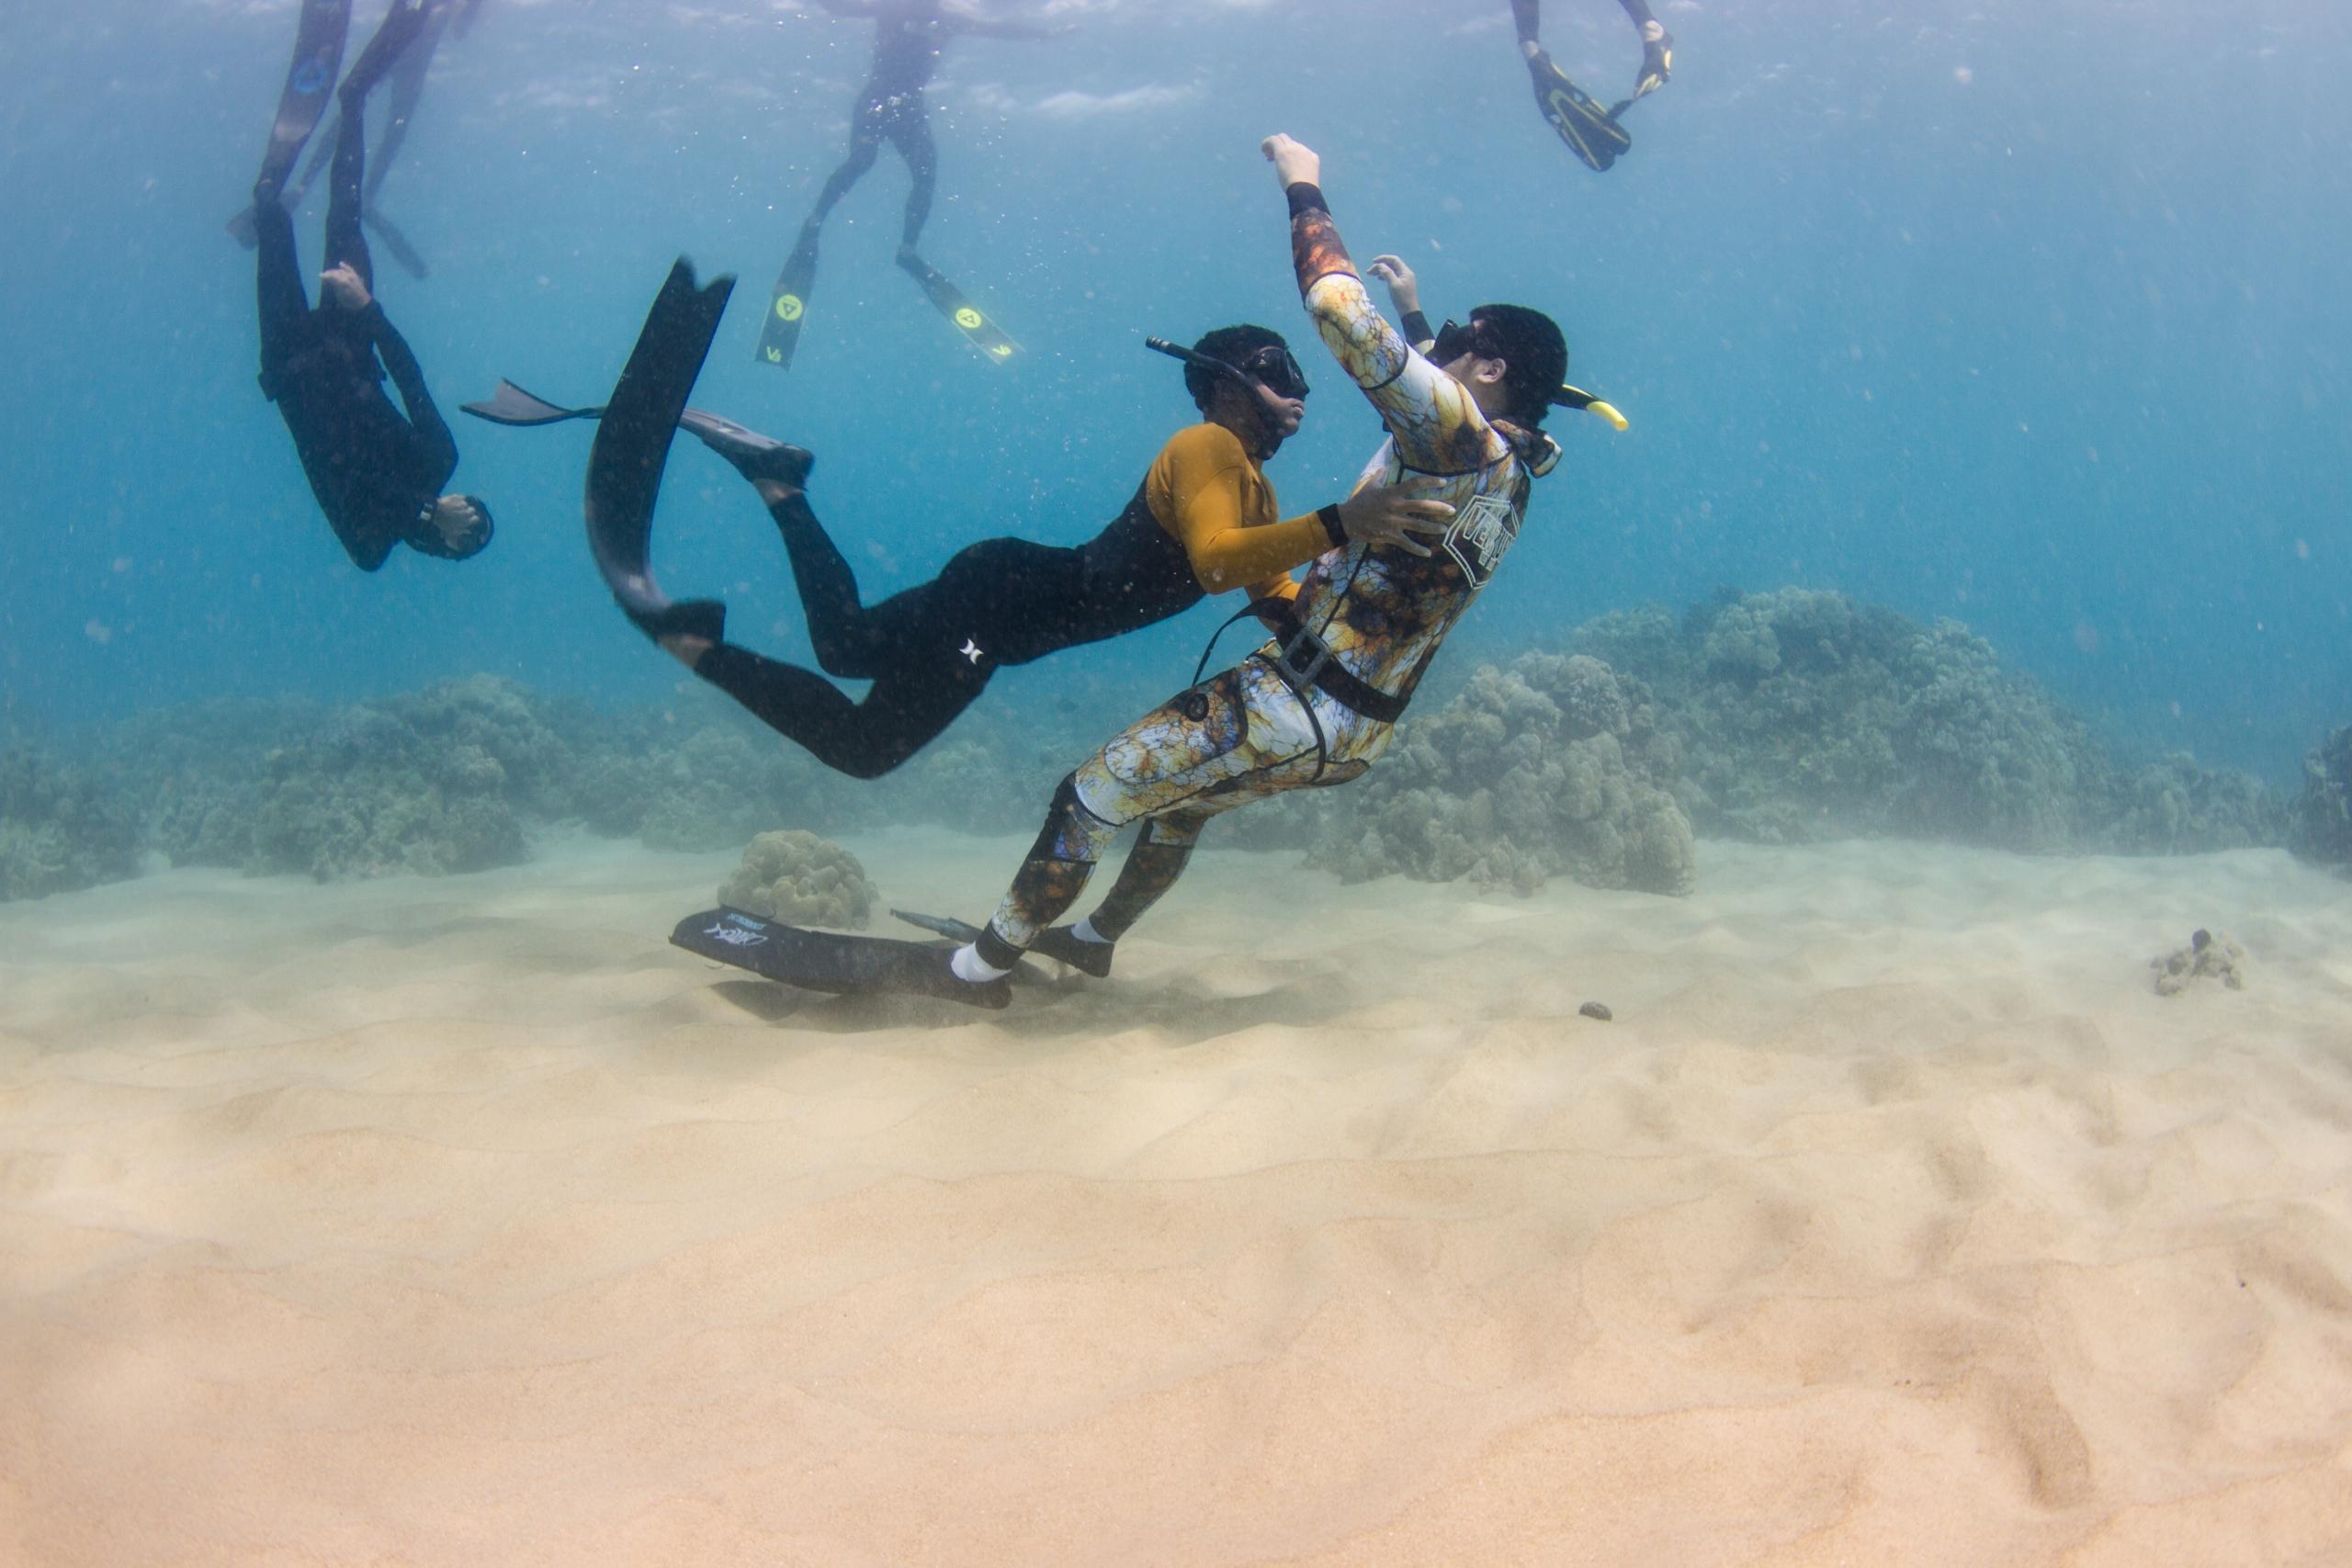 FreediveSafe! Hawaii - Freediving and Spearfishing Safety Training Kona